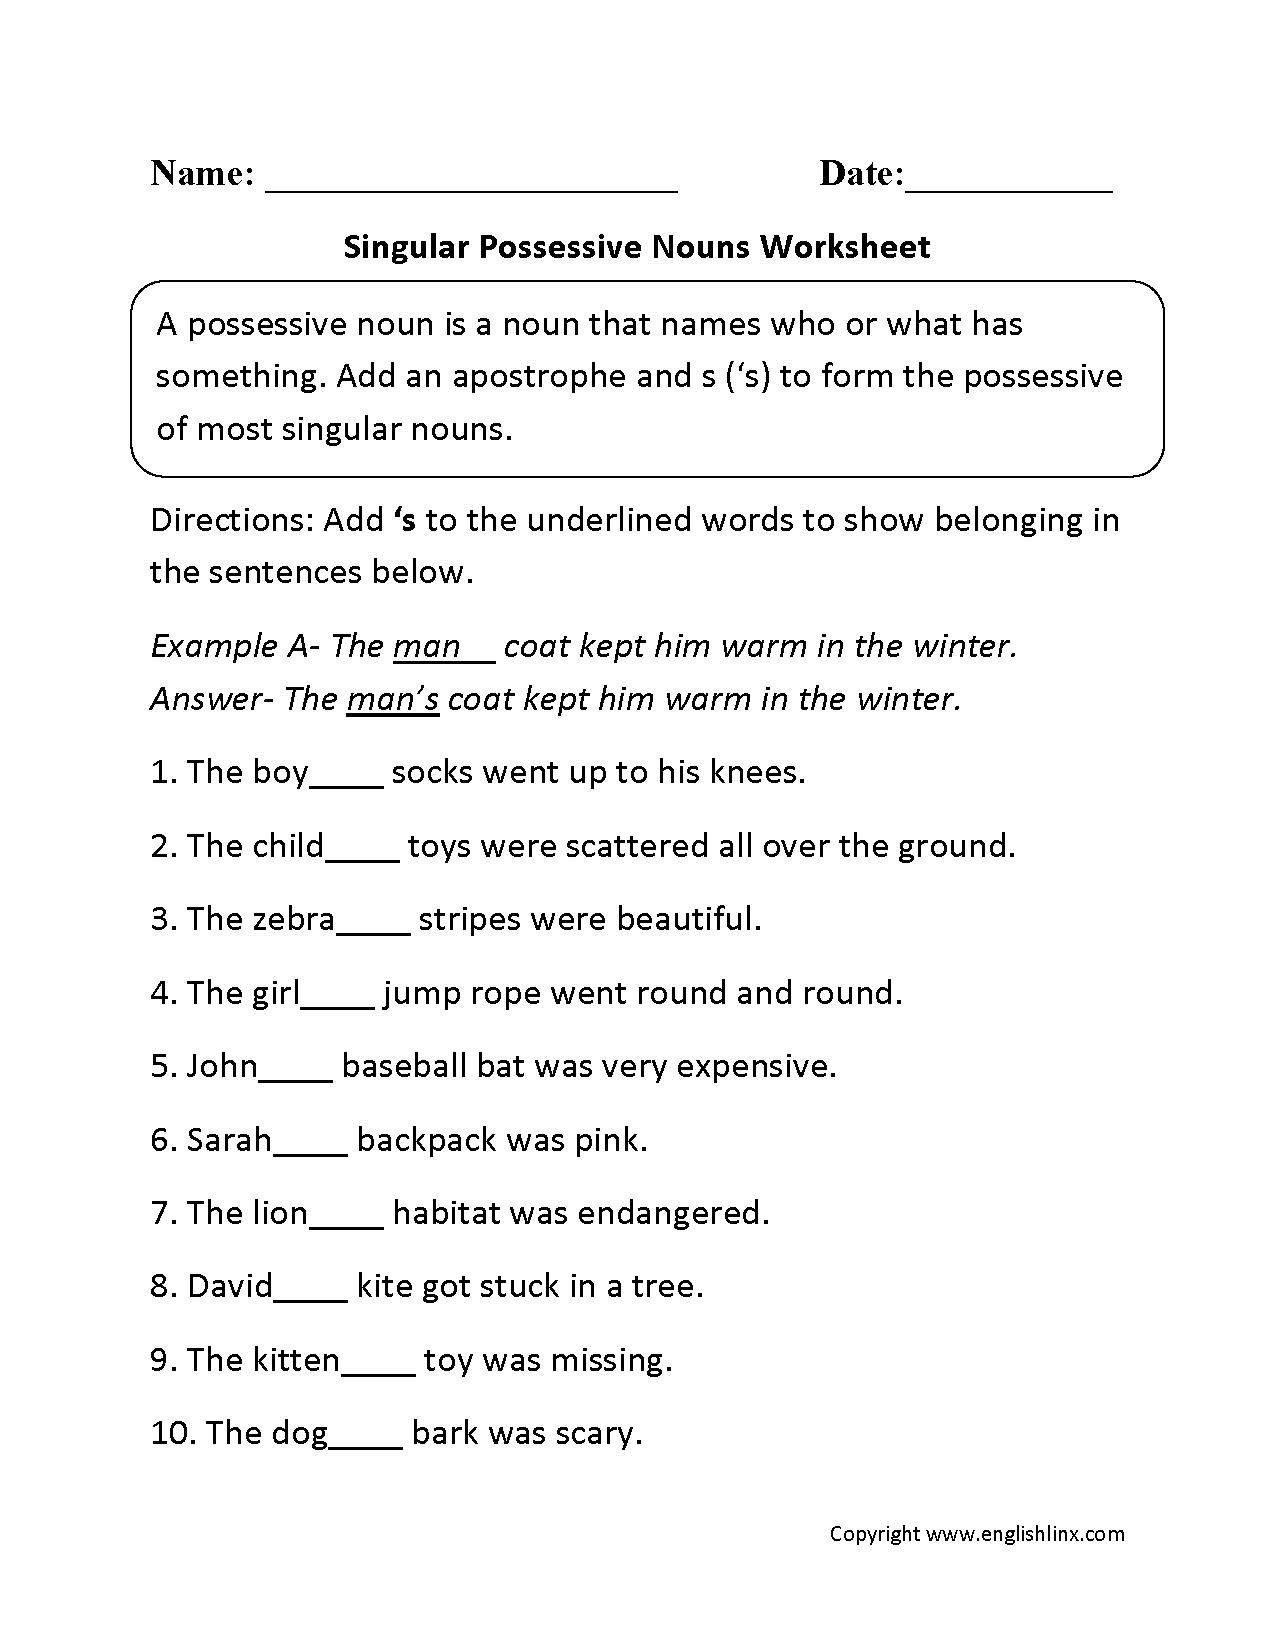 Possessive Noun Worksheets 4th Grade The Best Worksheets Image